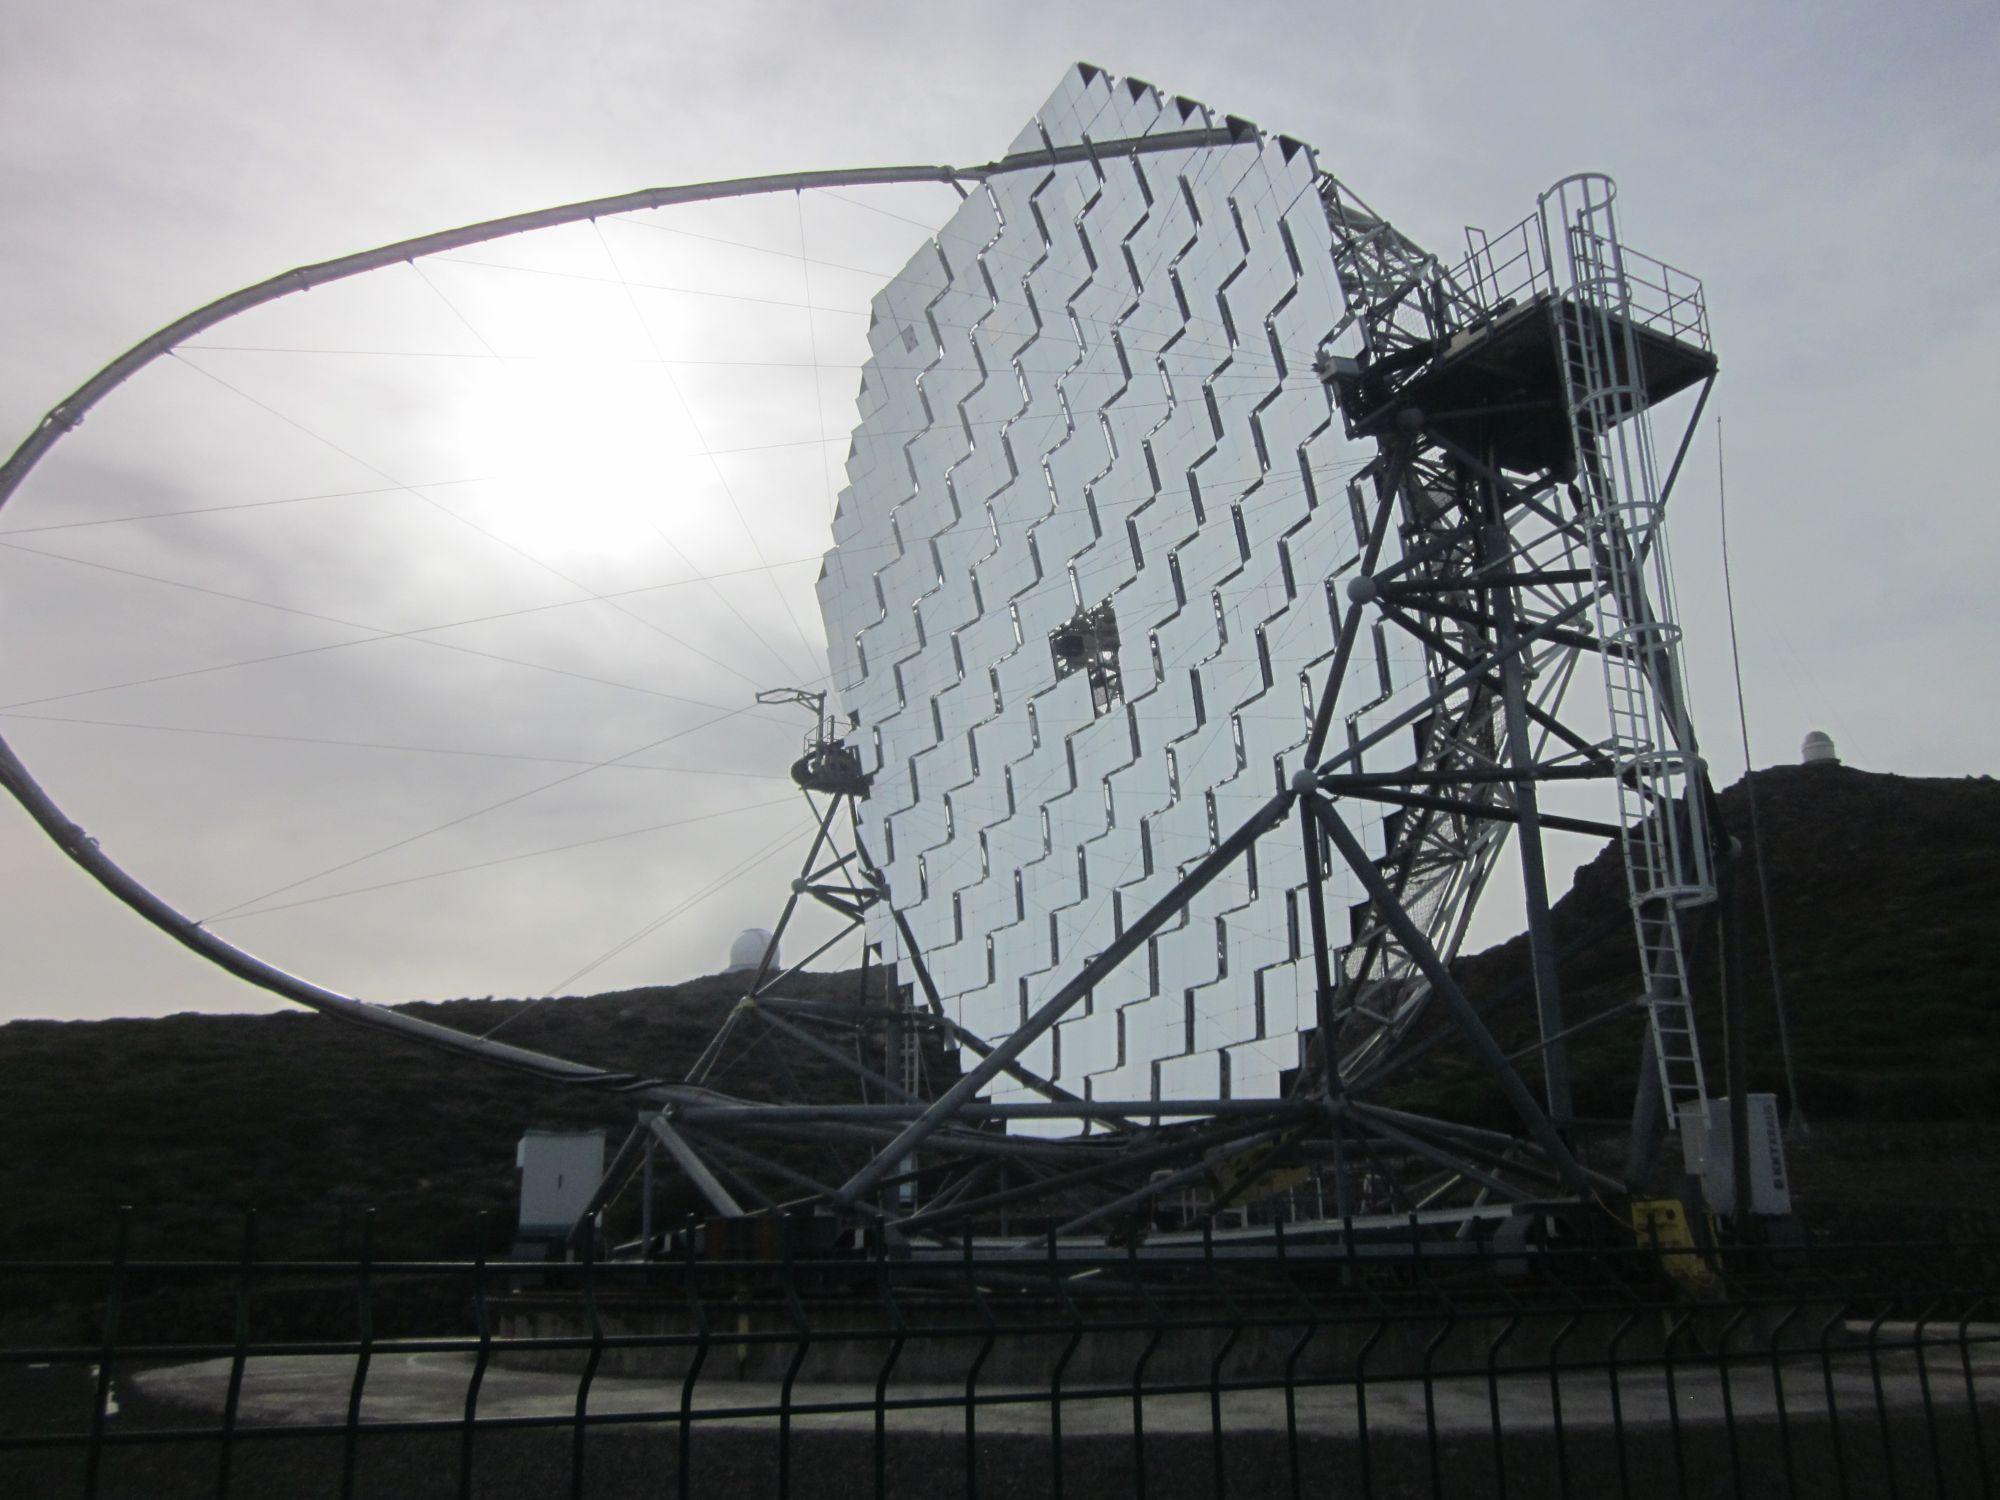 MAGIC telescope la palma